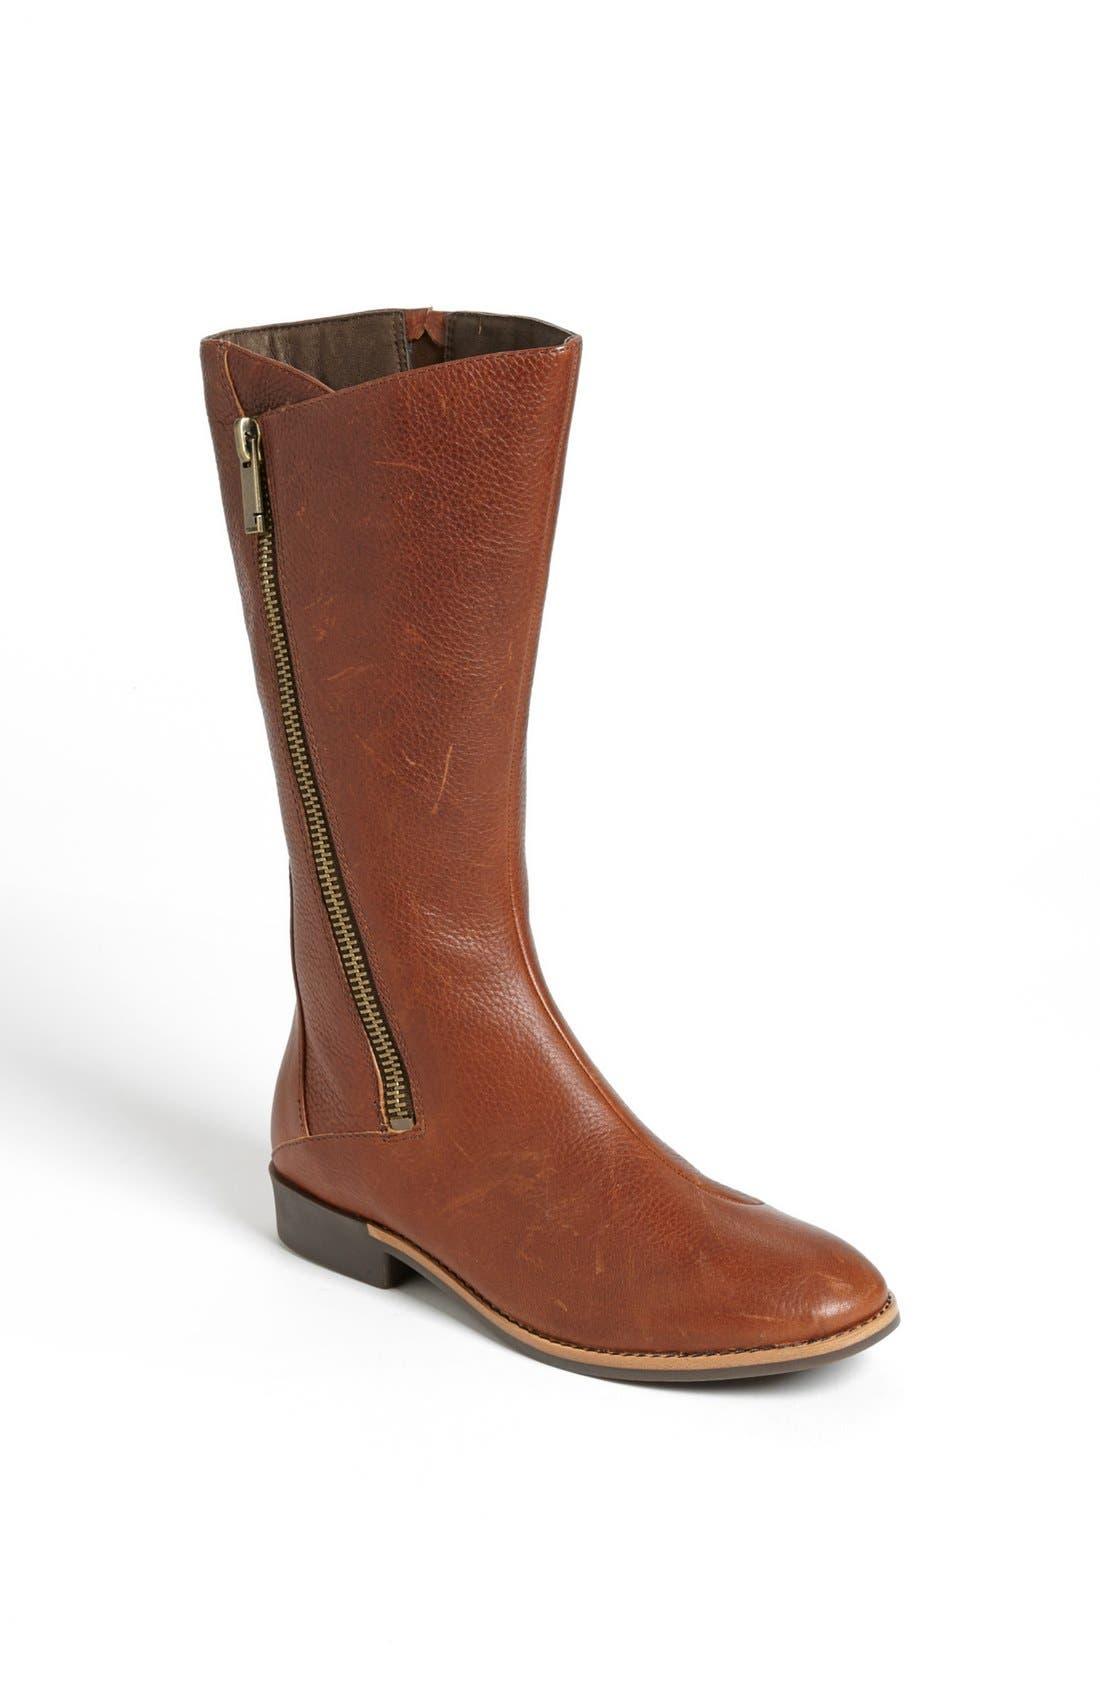 Alternate Image 1 Selected - Tsubo 'Loe' Boot